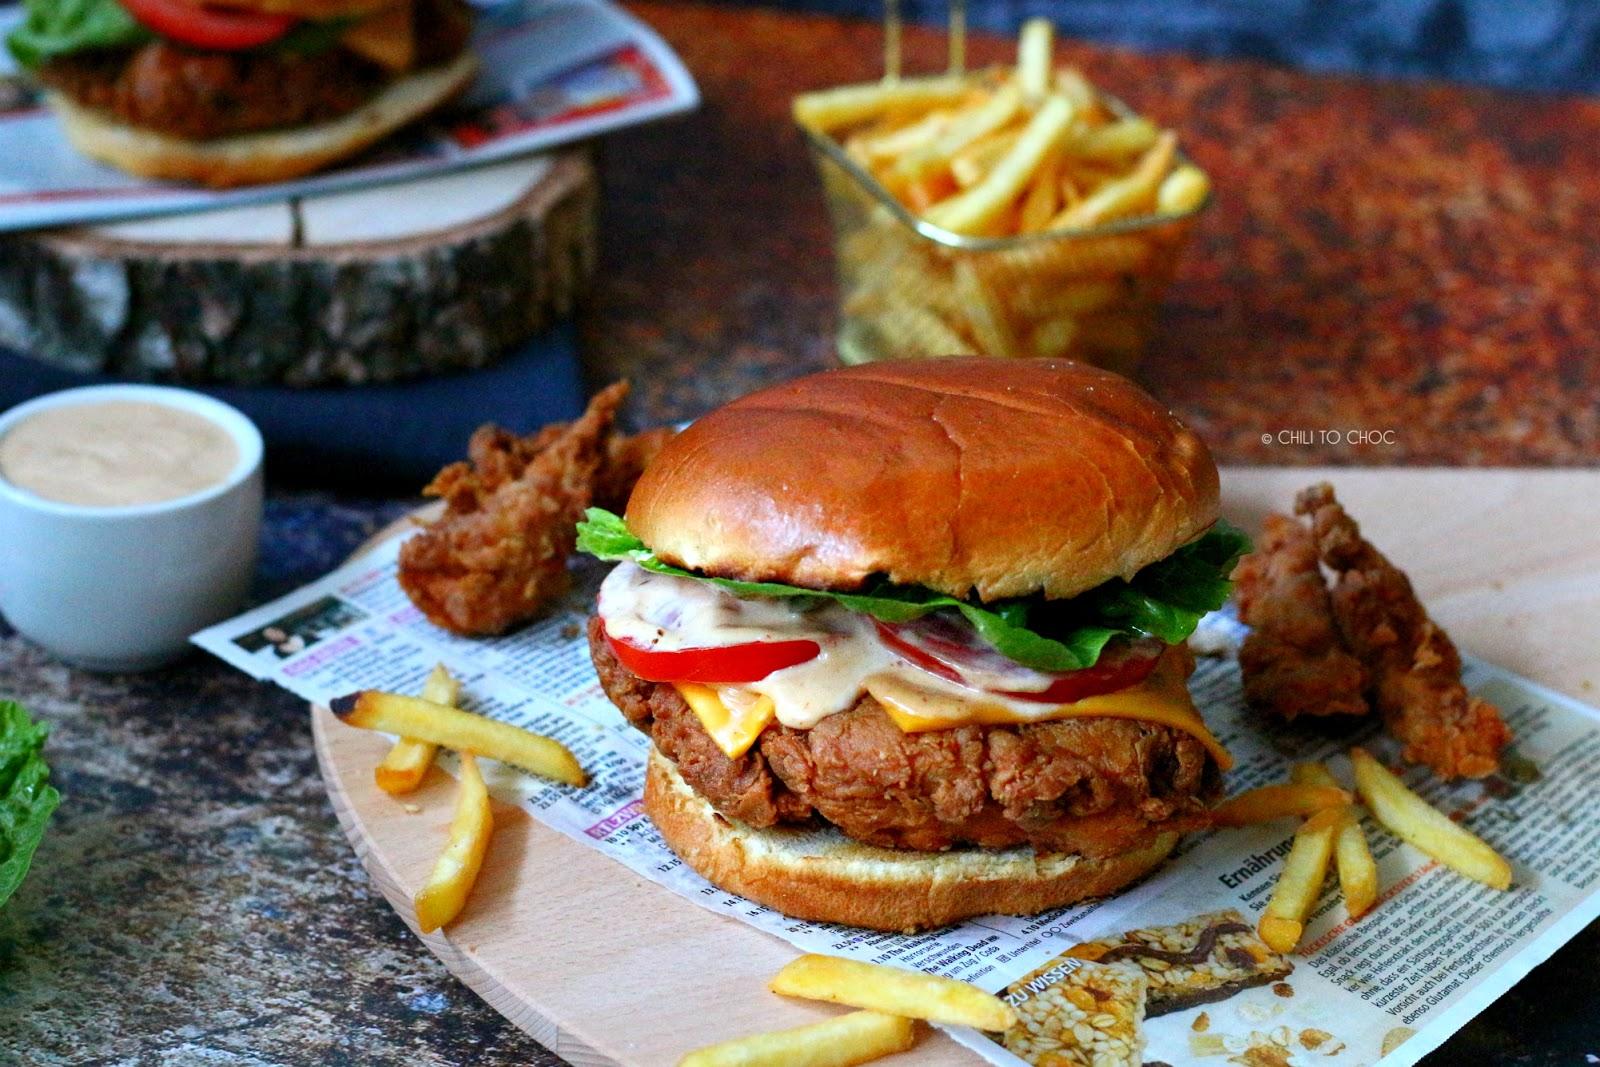 KFC-Style Crispy Chicken Burger (Zinger Burger)